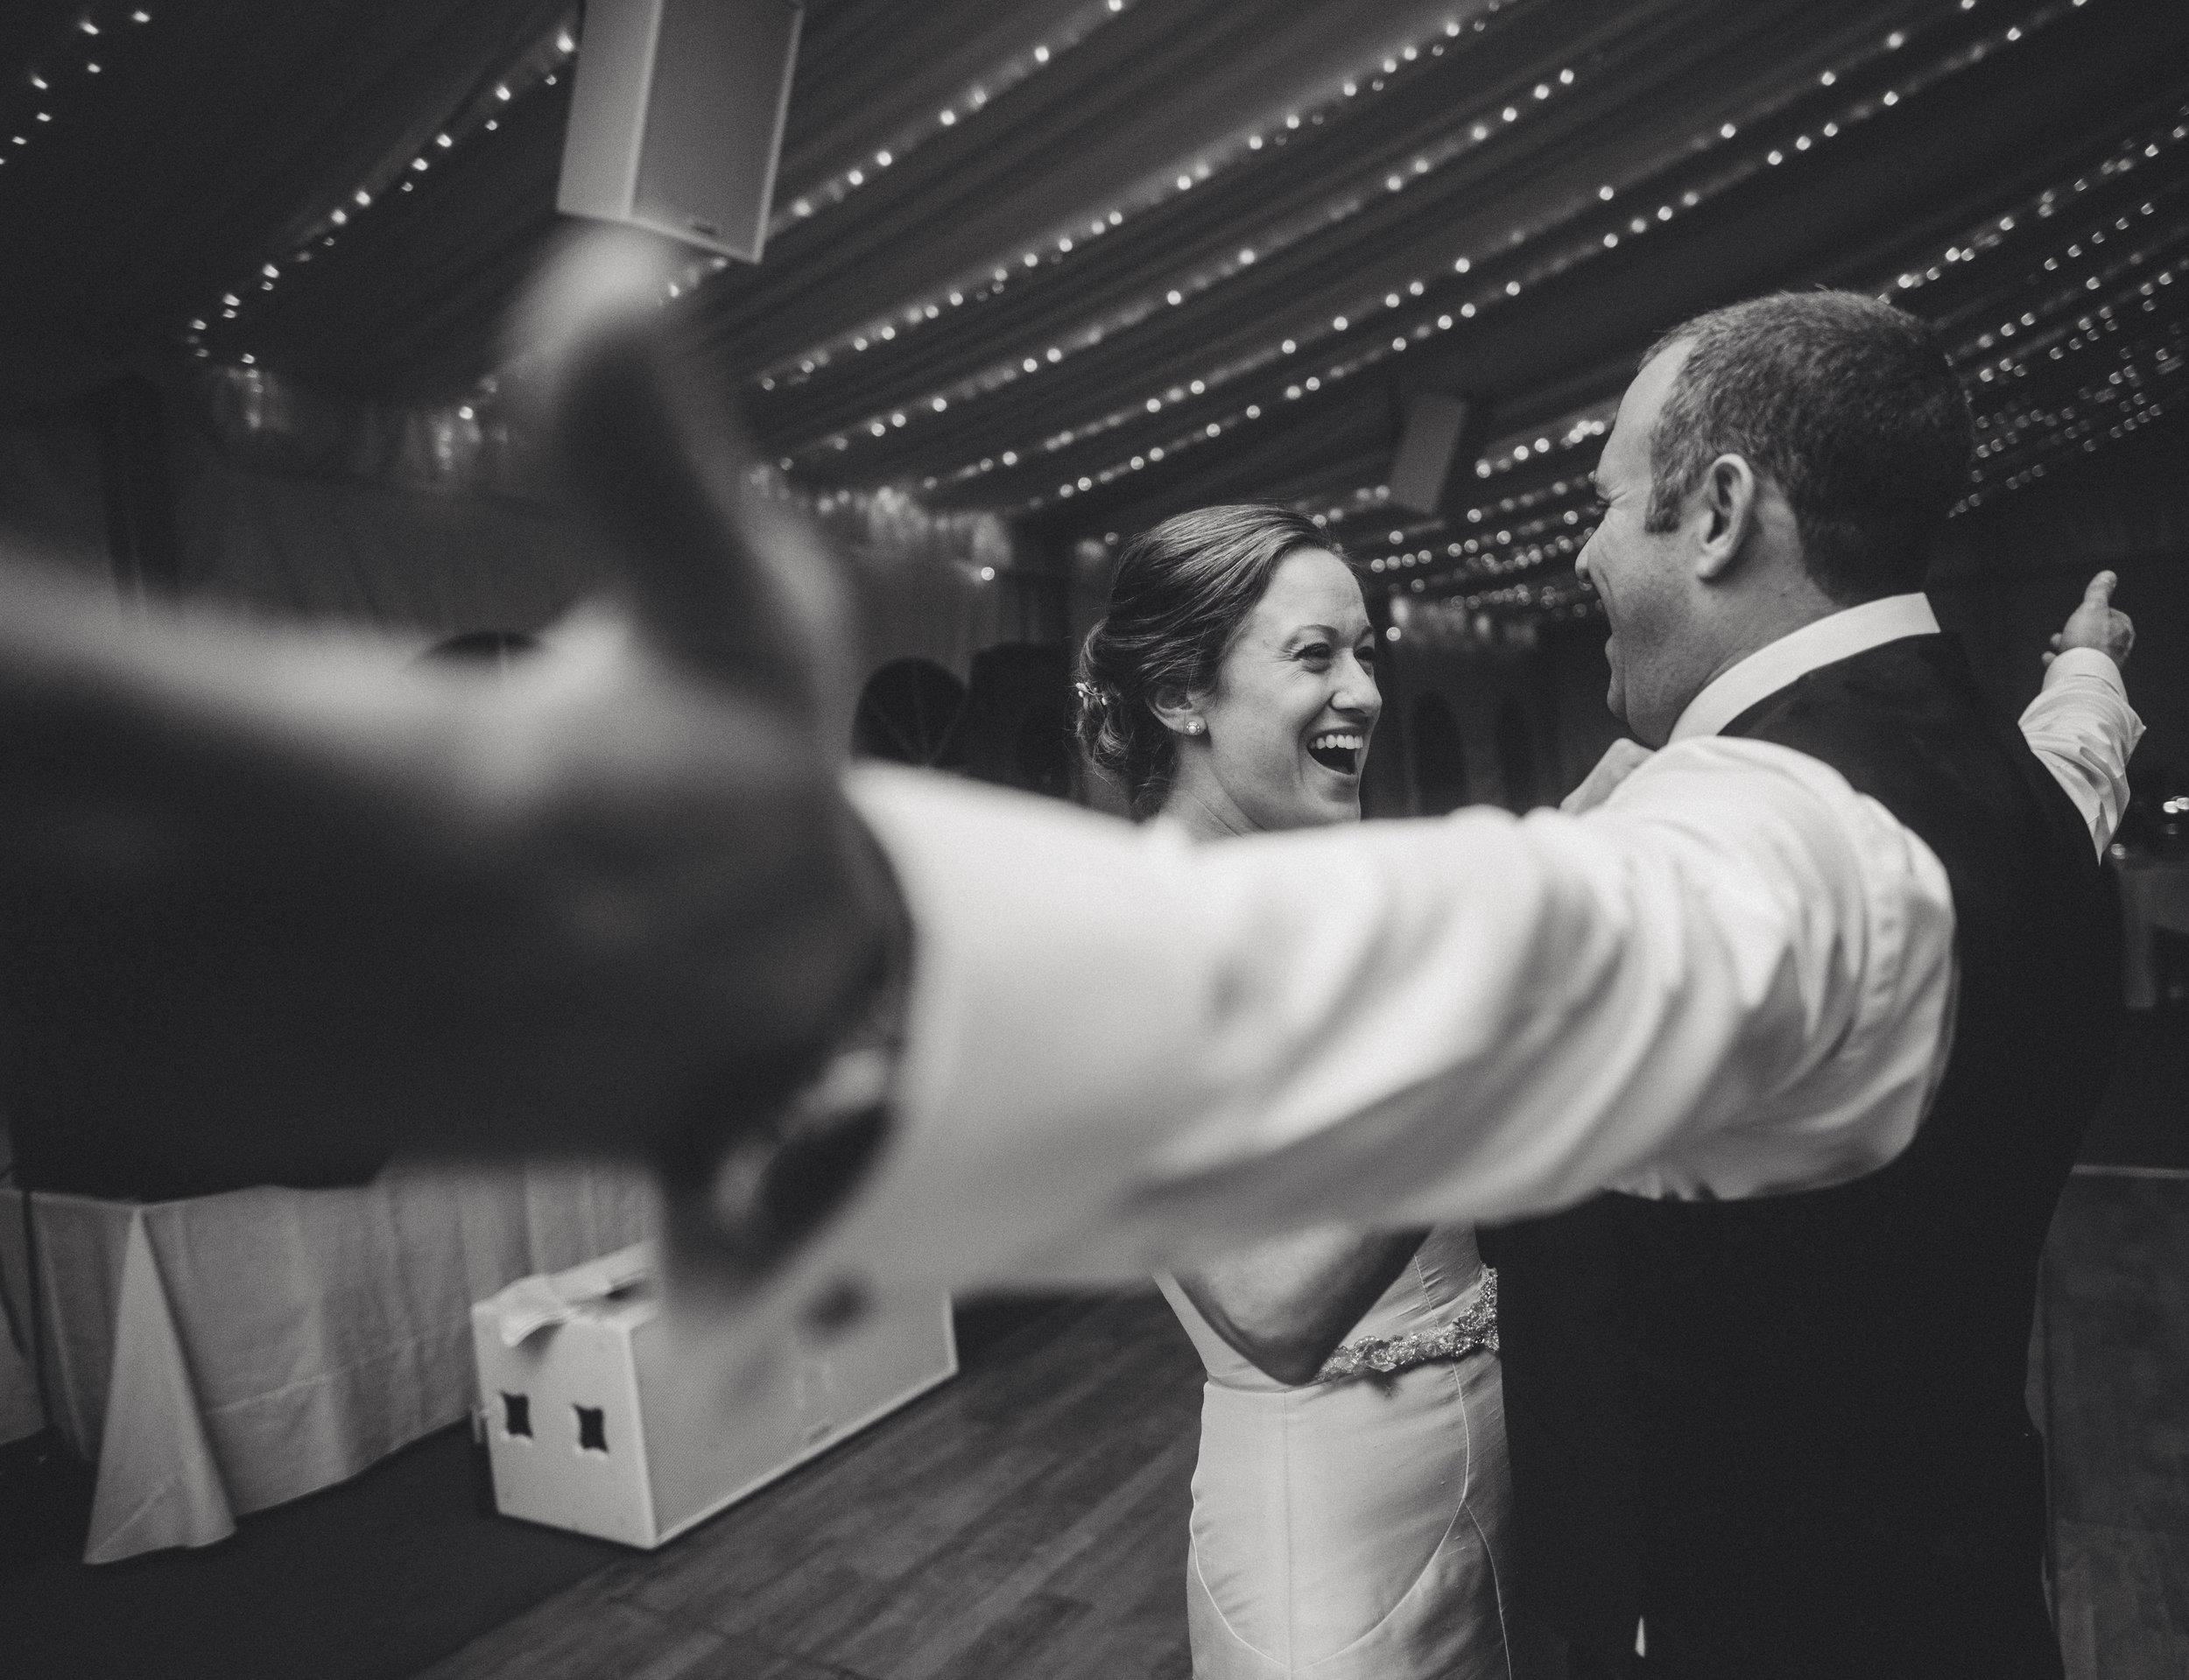 JACQUELINE & ANDREW WARSHAWER -BROOKMILL FARM FALL WEDDING - INTIMATE WEDDING PHOTOGRAPHER - TWOTWENTY by CHI-CHI AGBIM-779.jpg